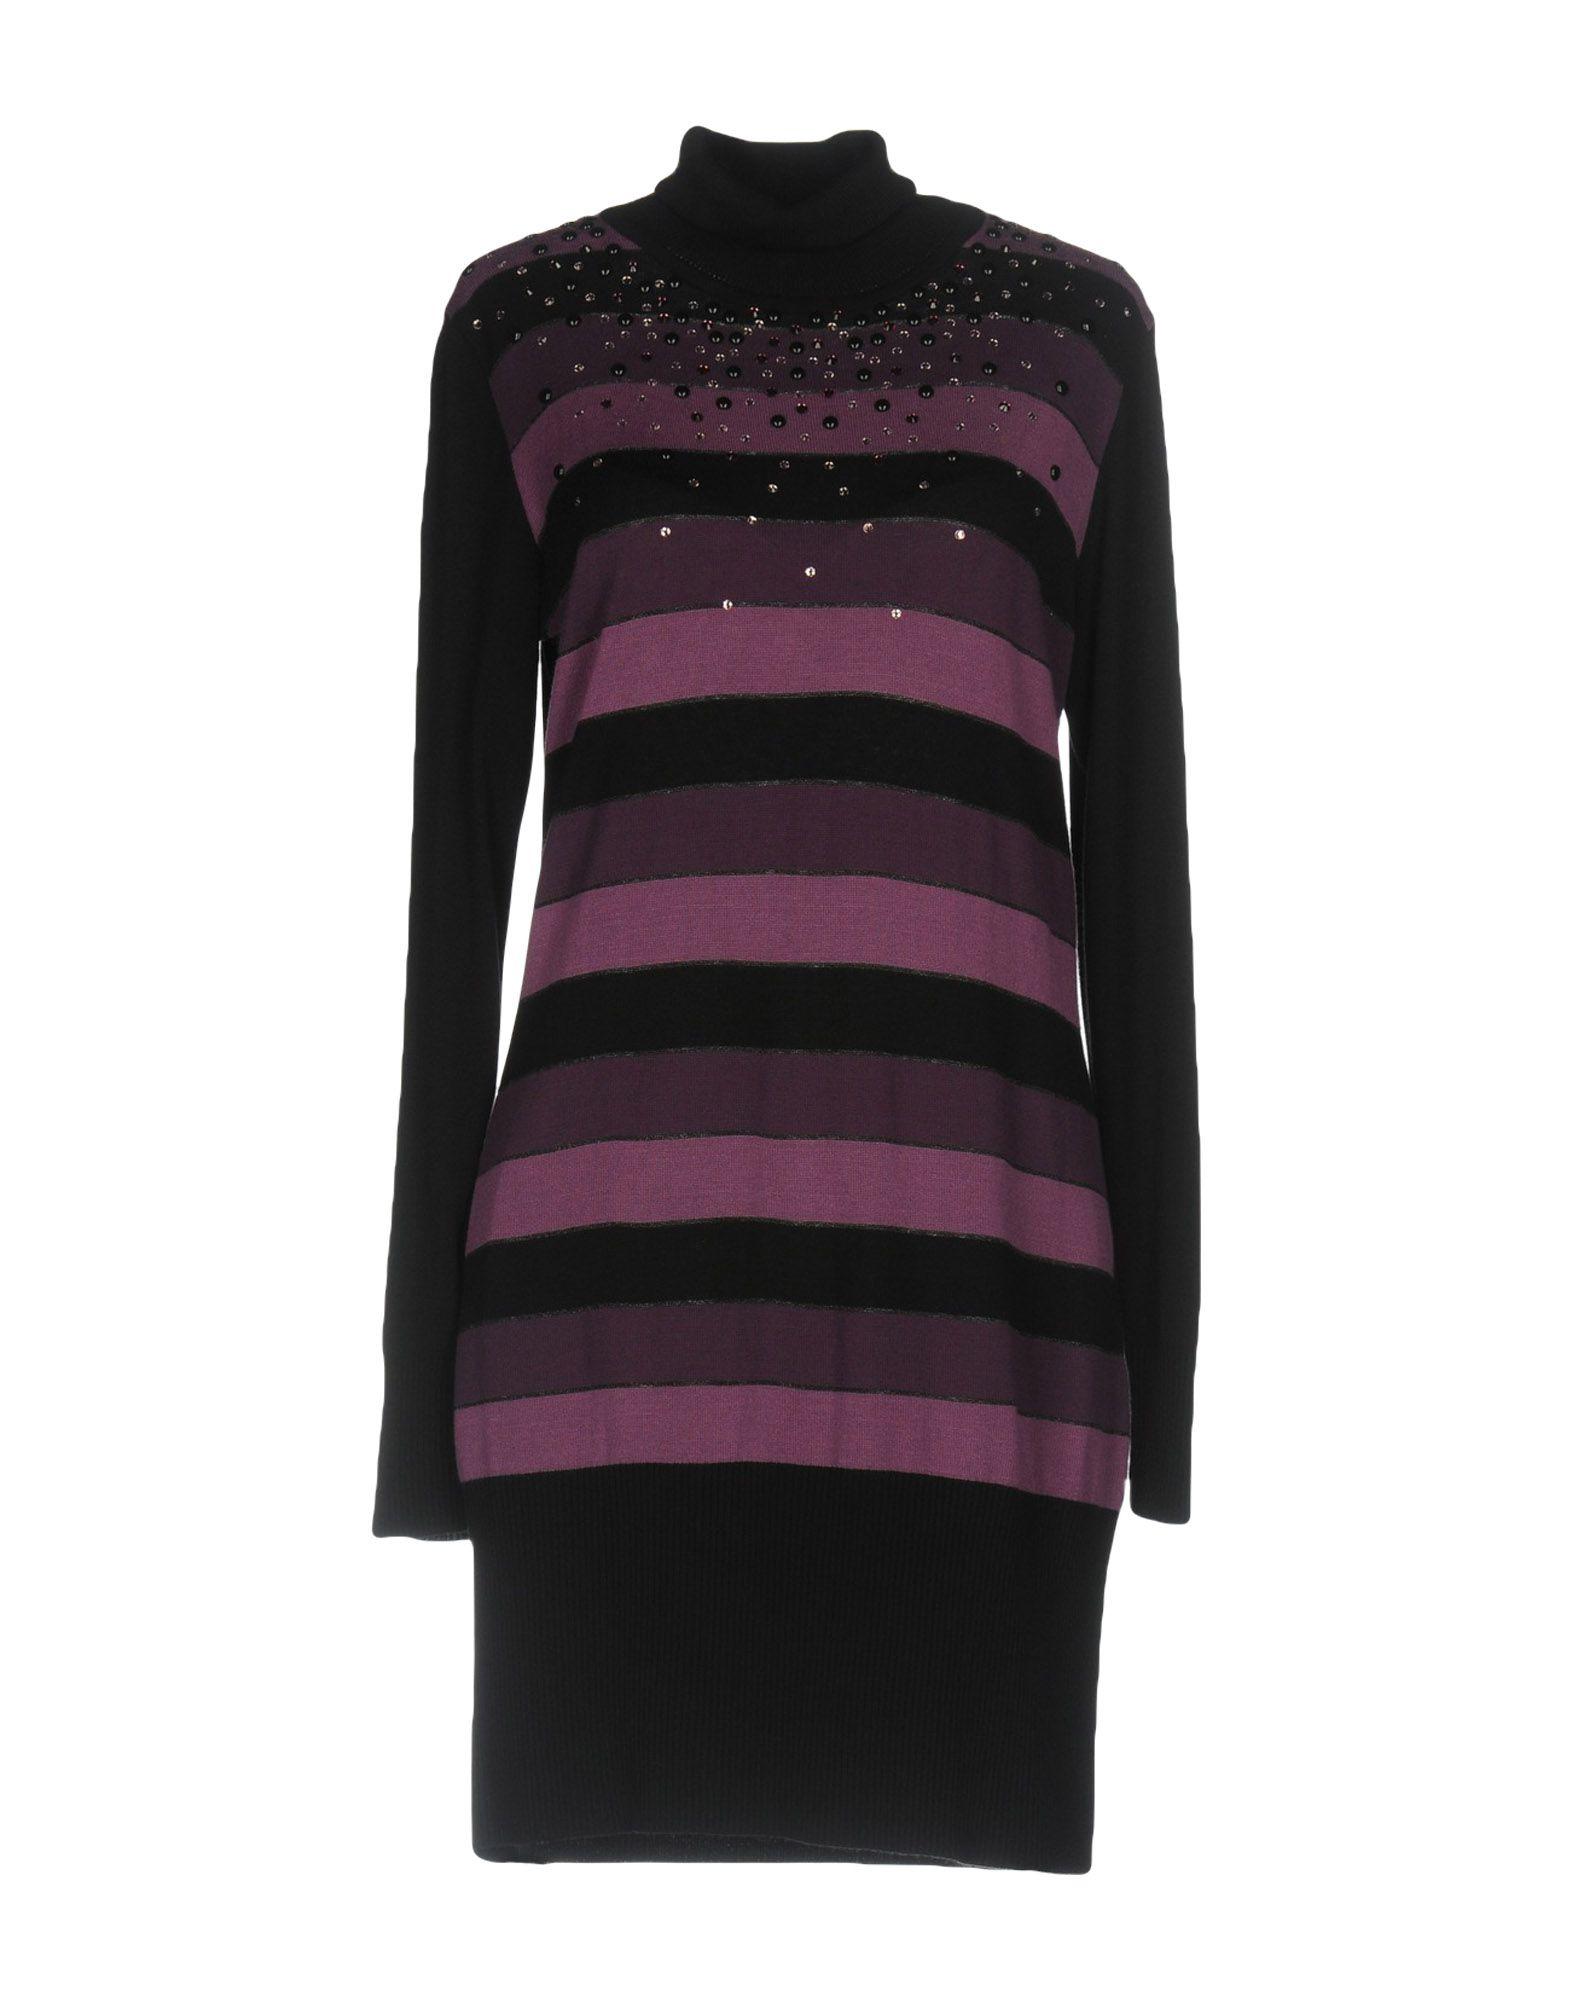 ELISA FANTI Короткое платье запонки fanti 10 c 1052 20 e